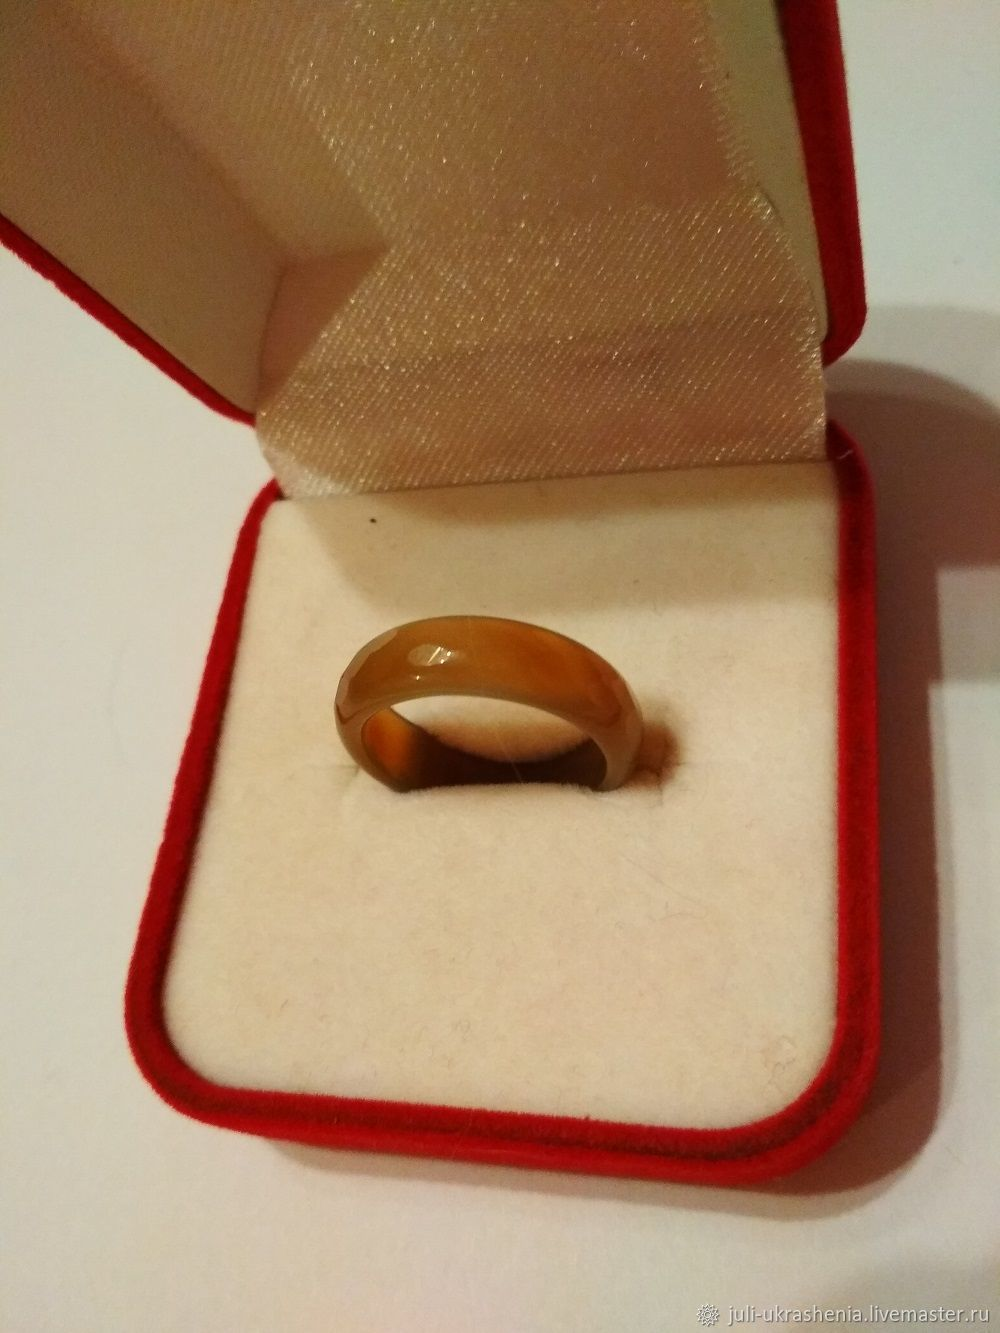 Винтаж: Винтажное кольцо из граненного агата, Винтажные кольца, Краснодар,  Фото №1